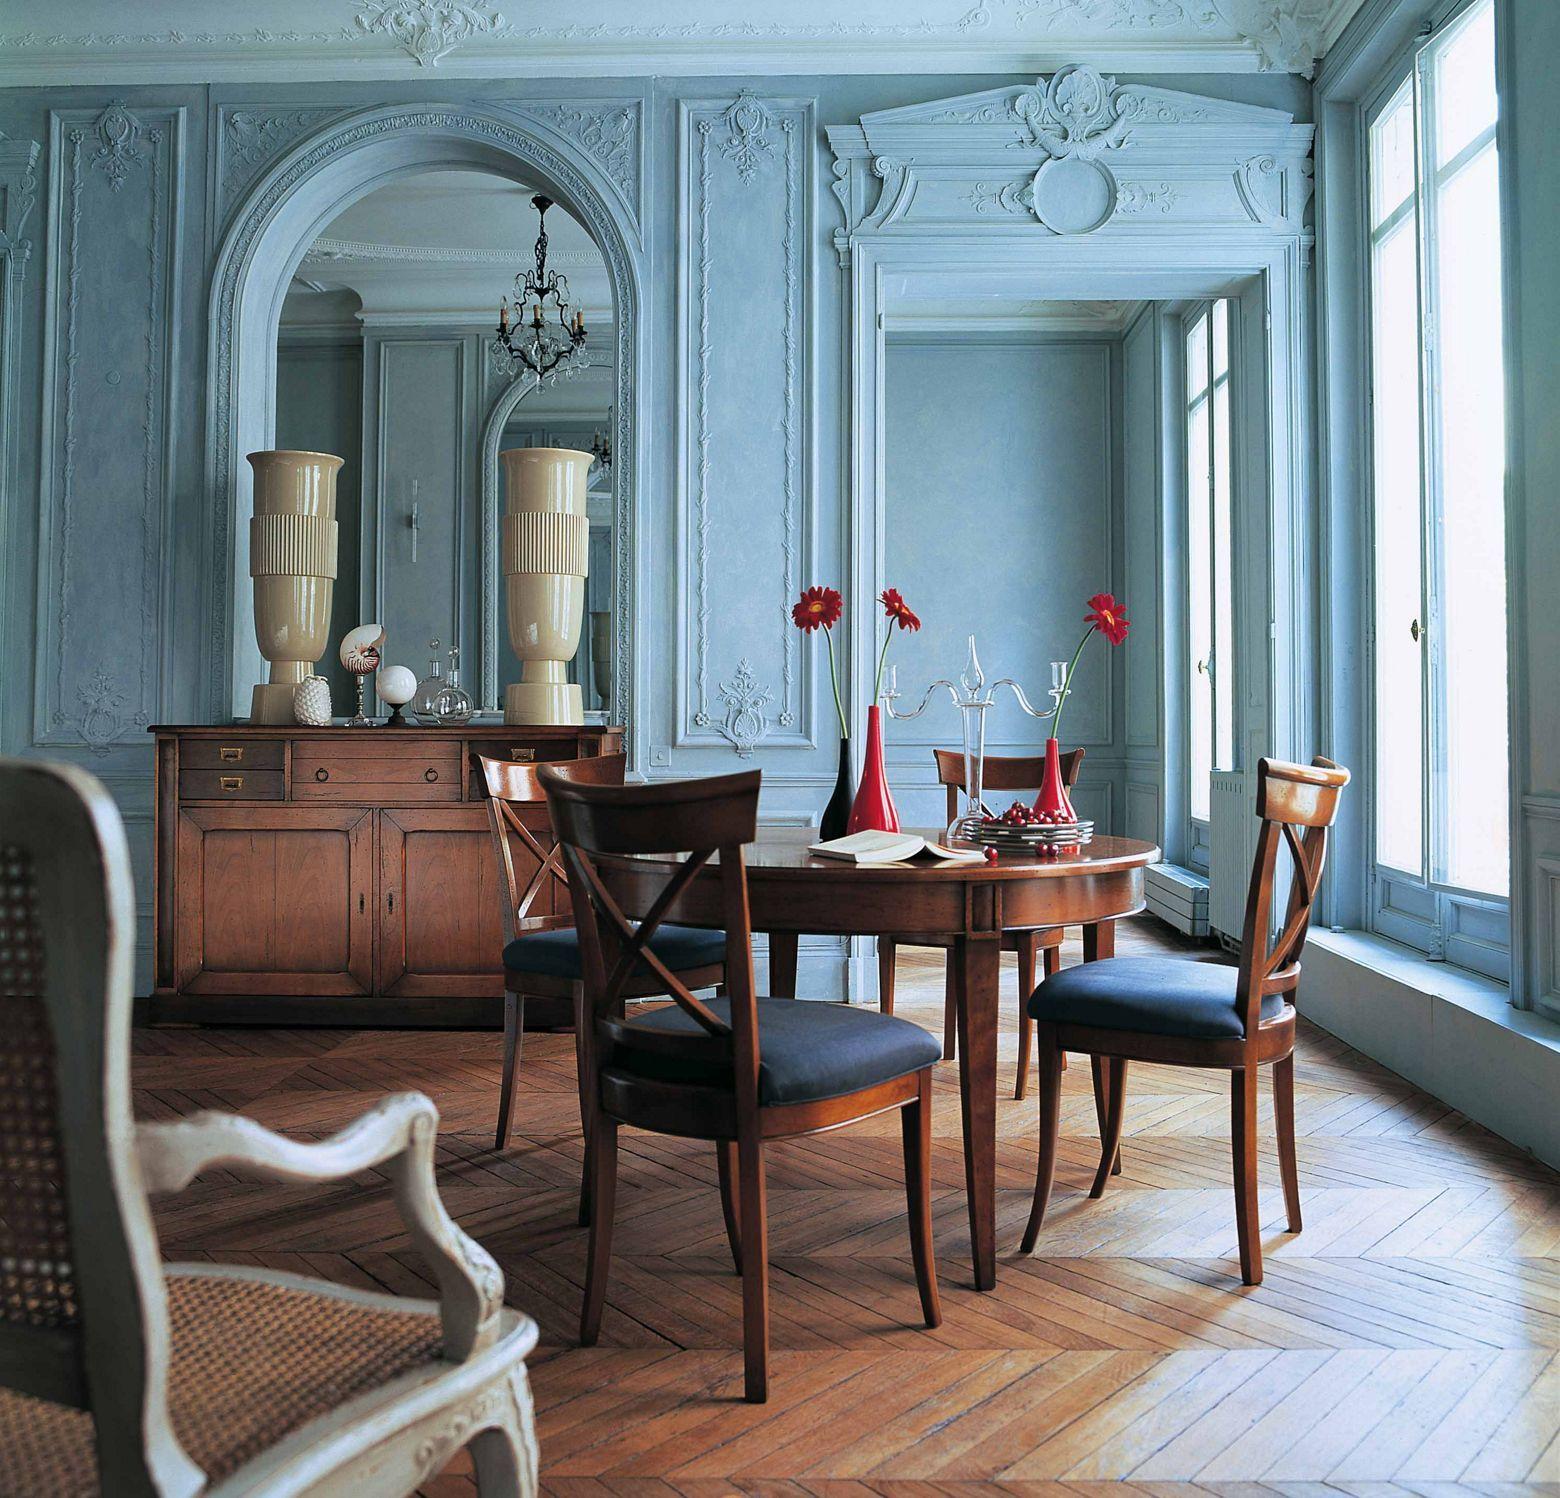 meuble salle a manger roche bobois excellent meuble salle a manger roche bobois with meuble. Black Bedroom Furniture Sets. Home Design Ideas